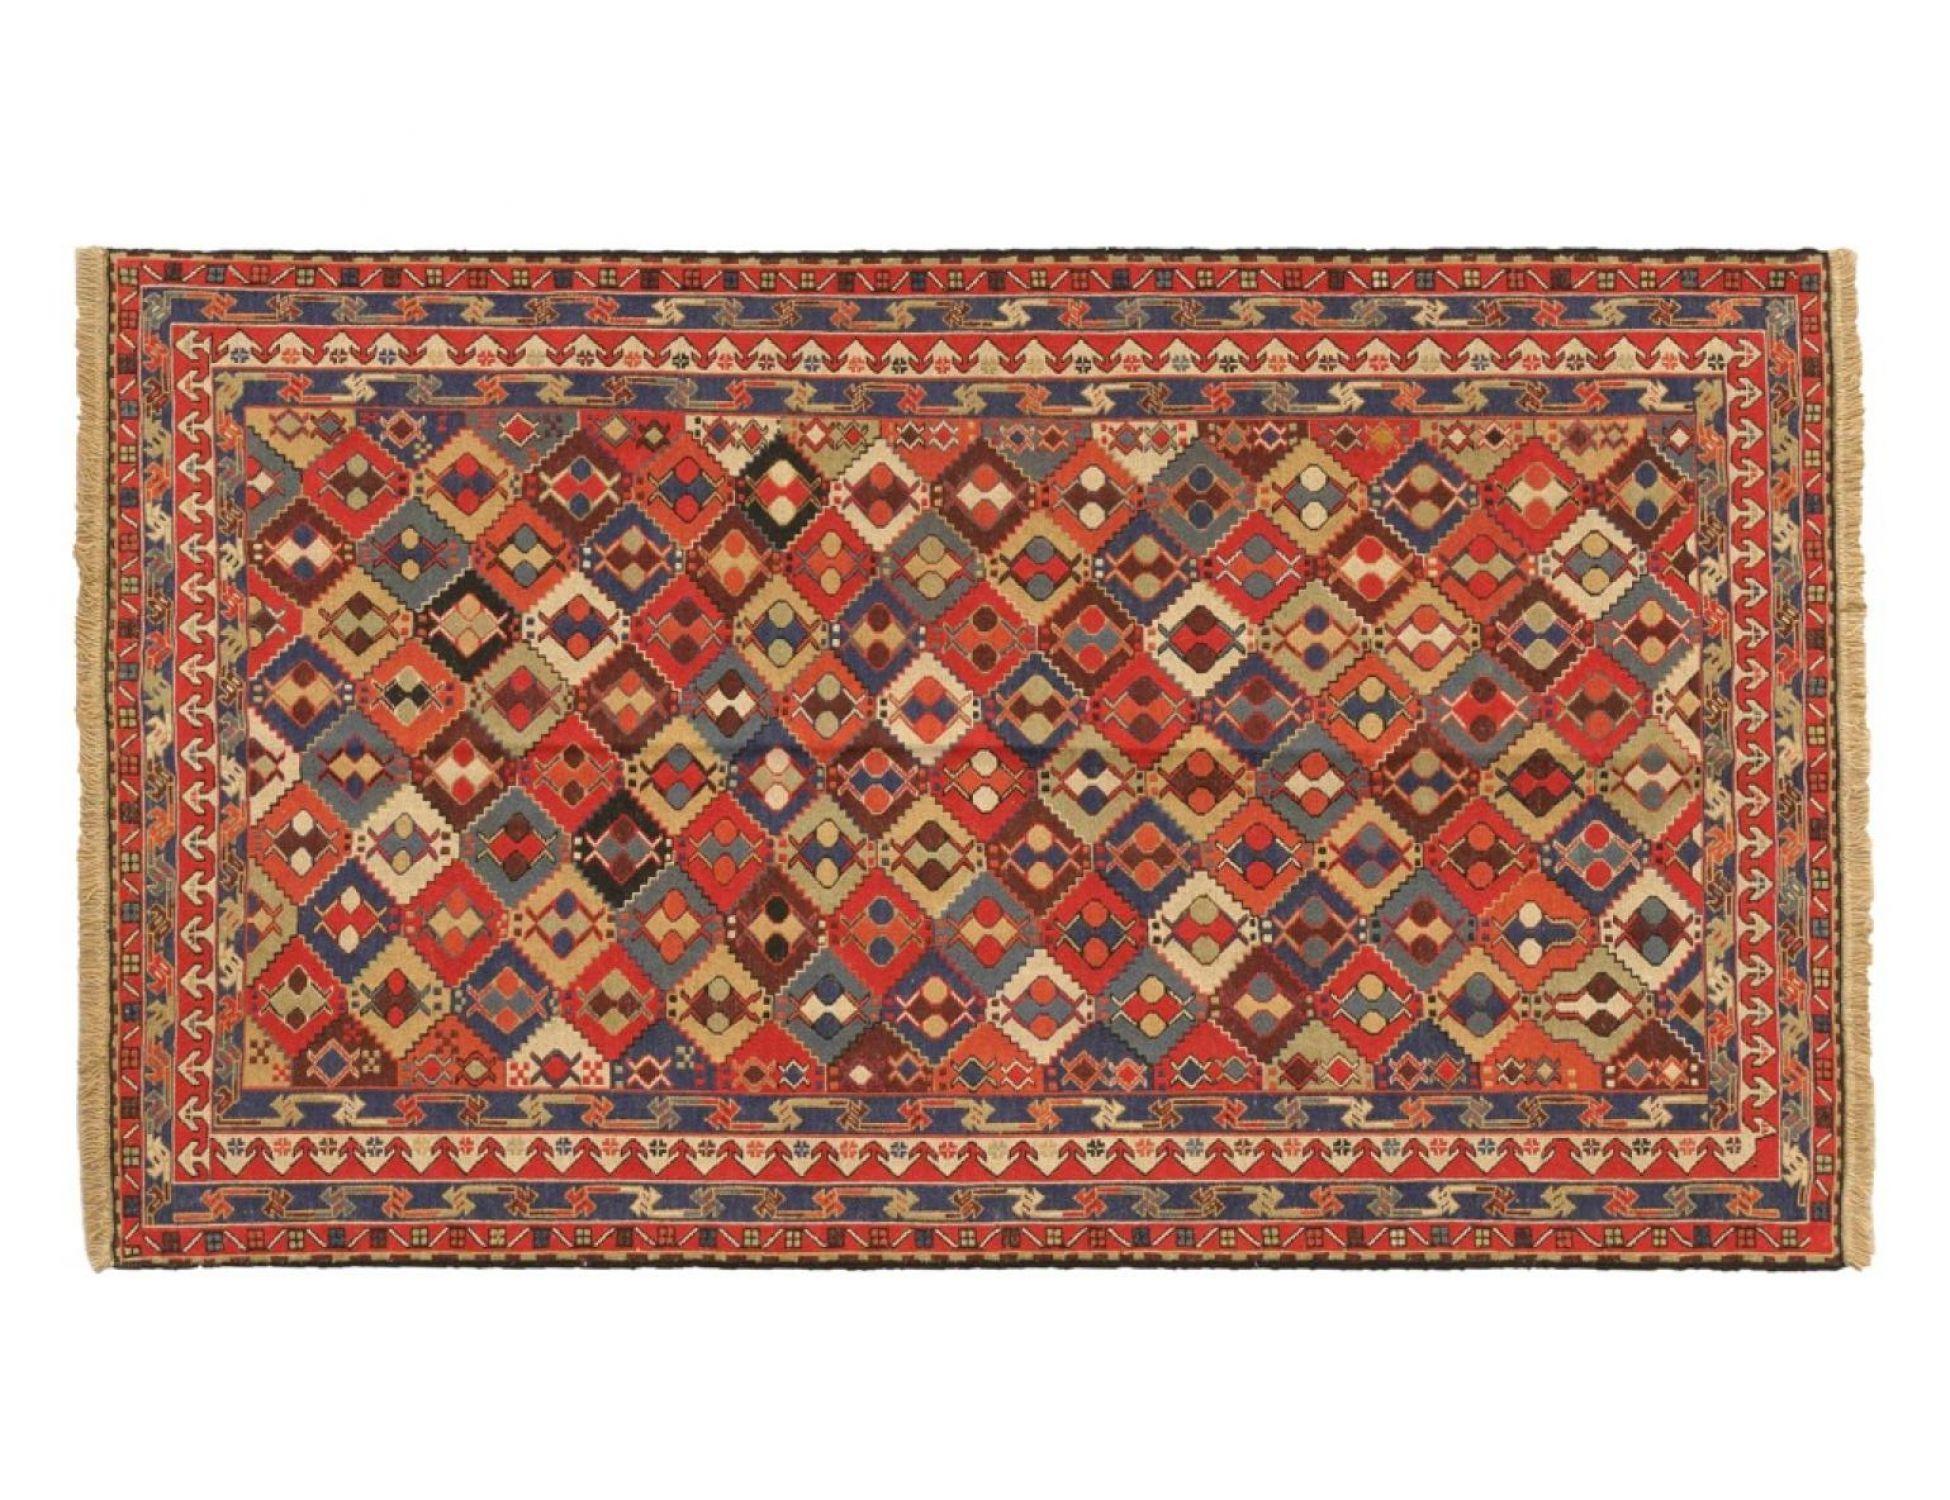 PERSIAN WOOL KILIMS   <br/>147 x 105 cm